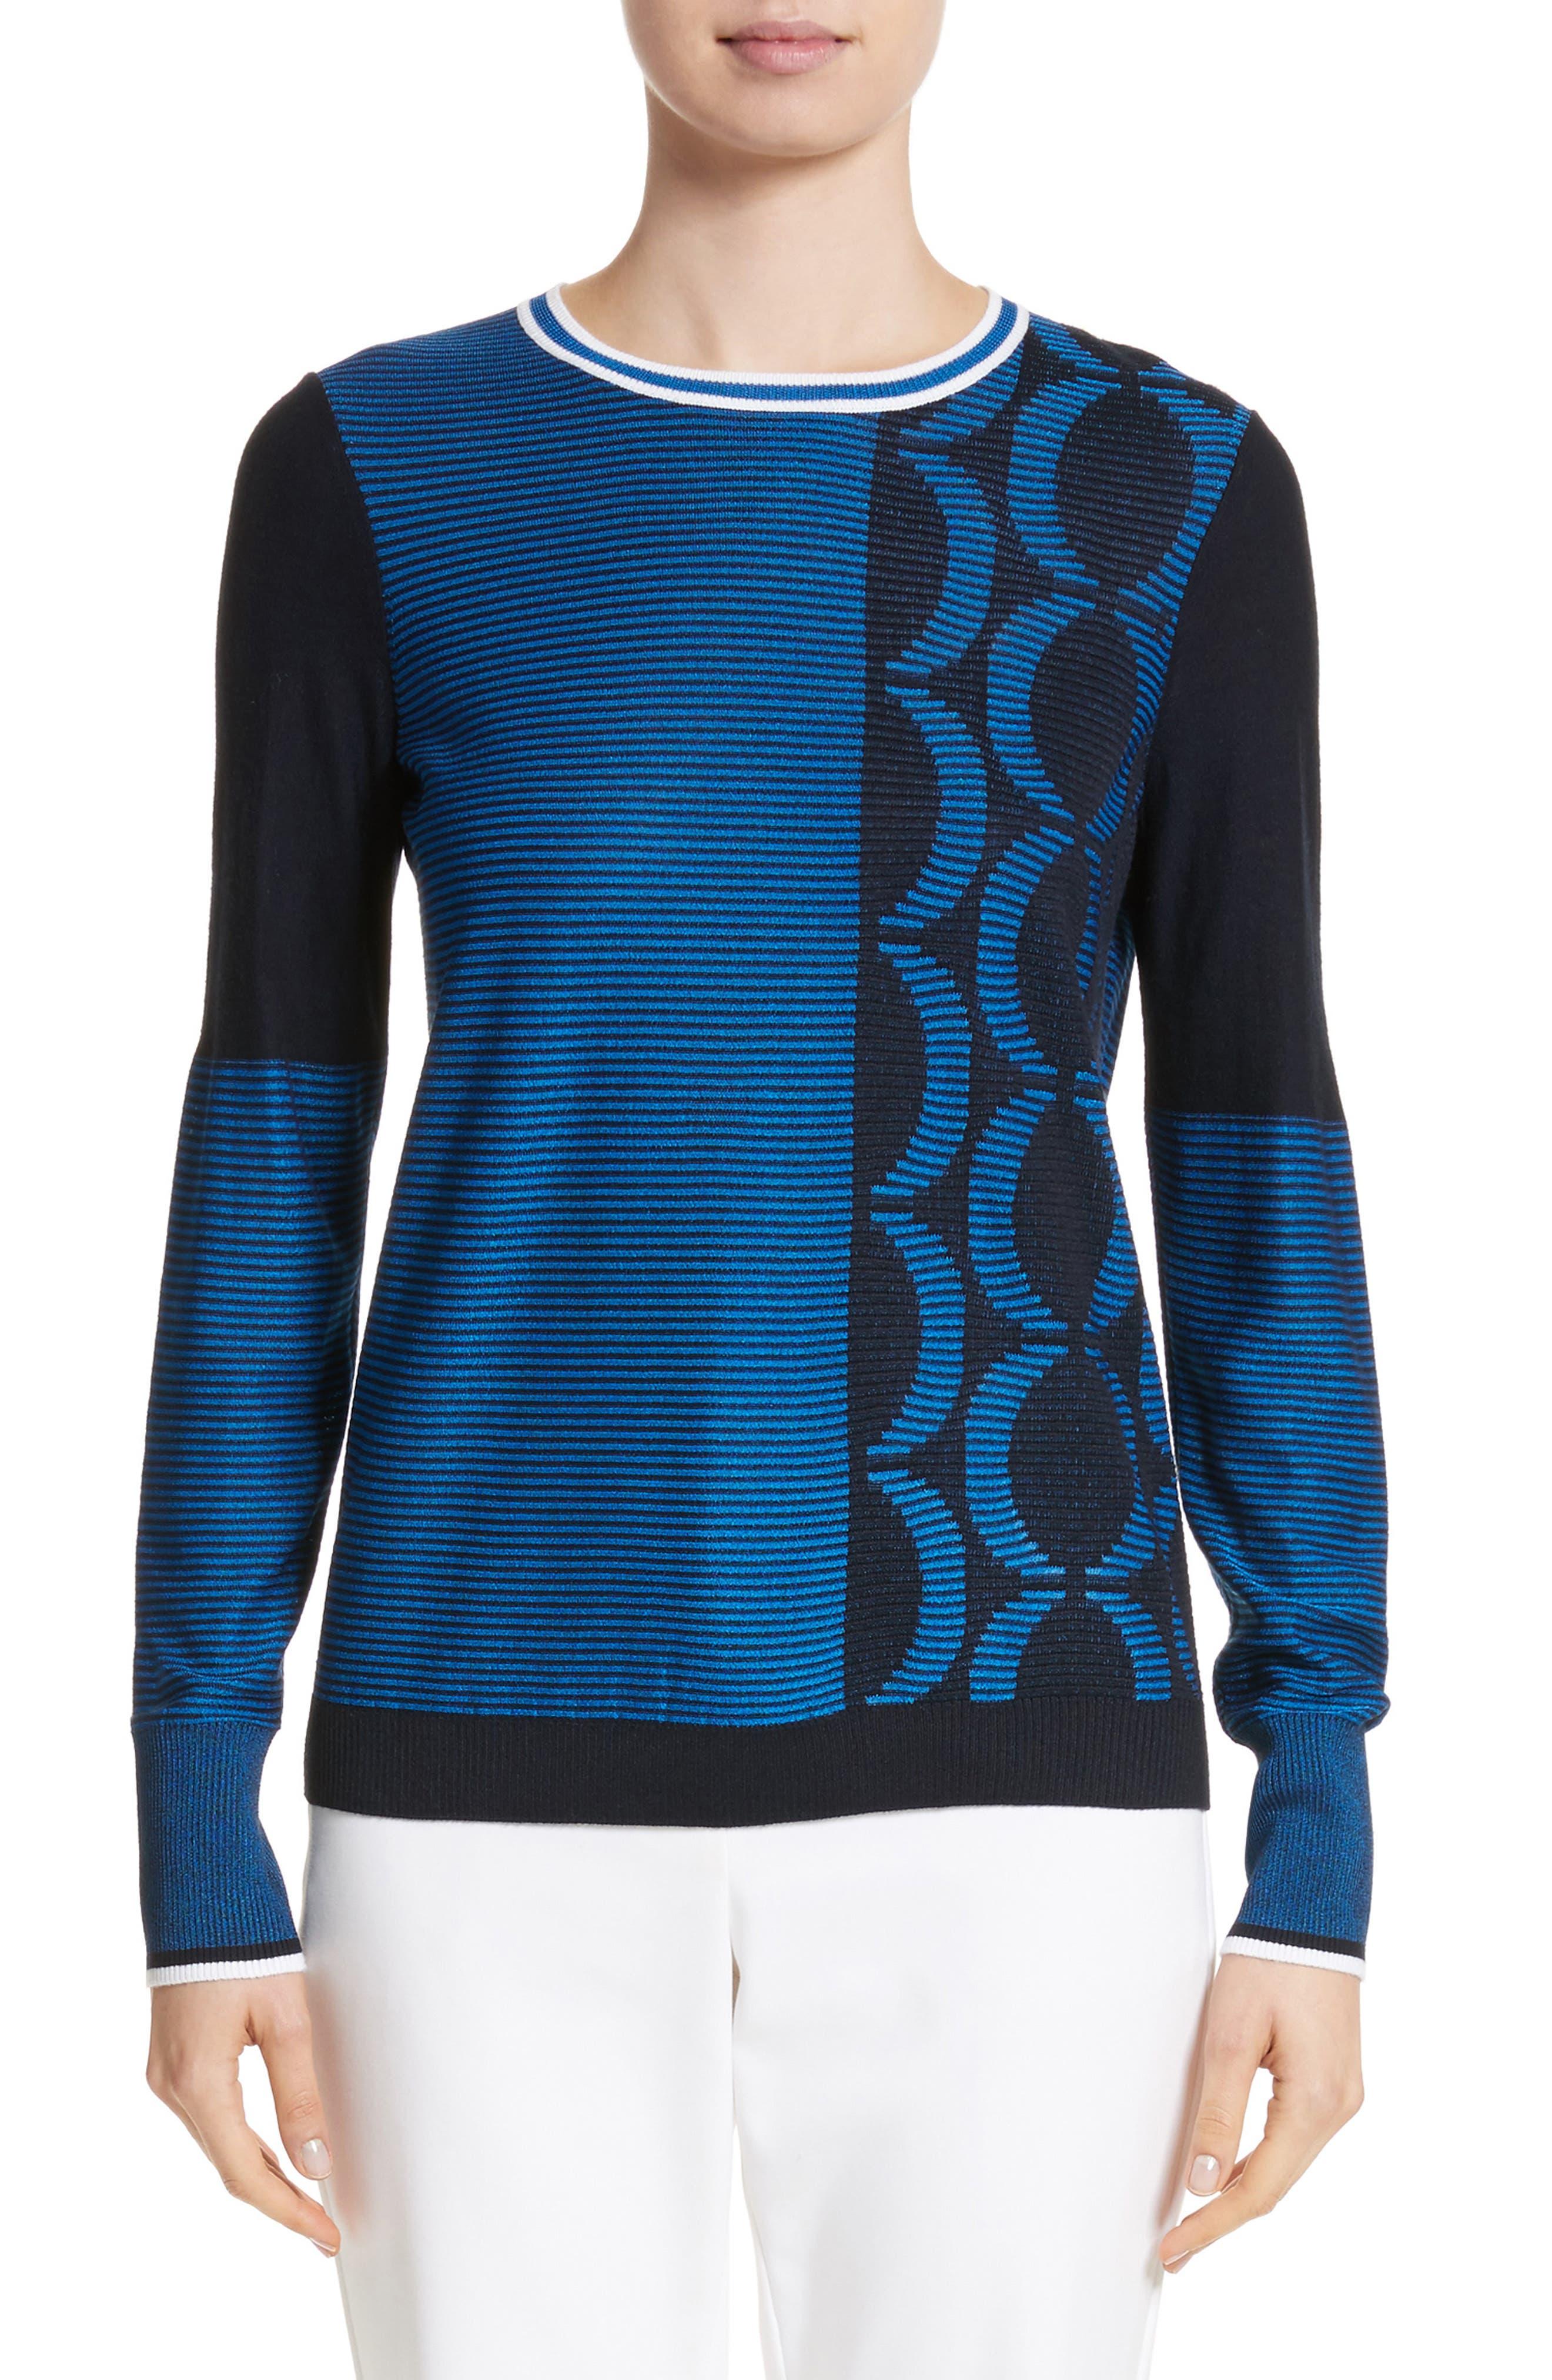 Jacquard Knit Sweater,                         Main,                         color, Navy/ Niagara/ Bianco